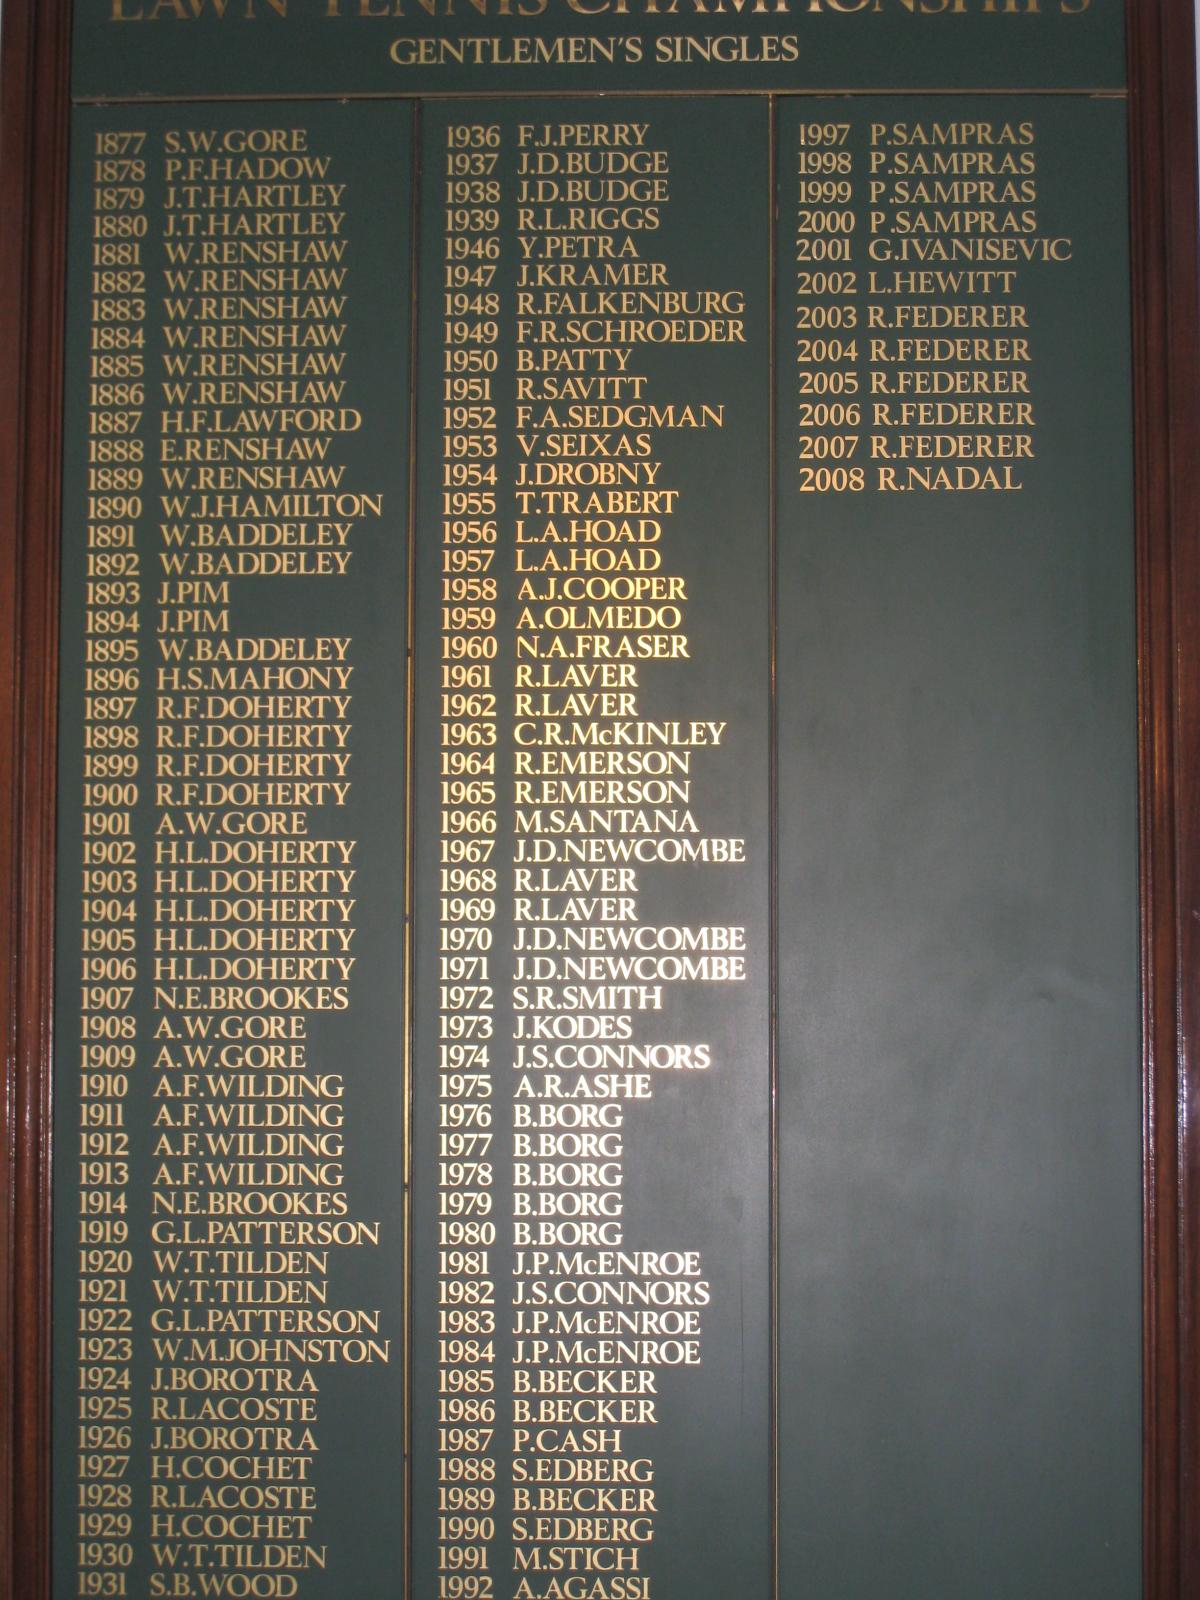 2002 singles wimbledon mens List of